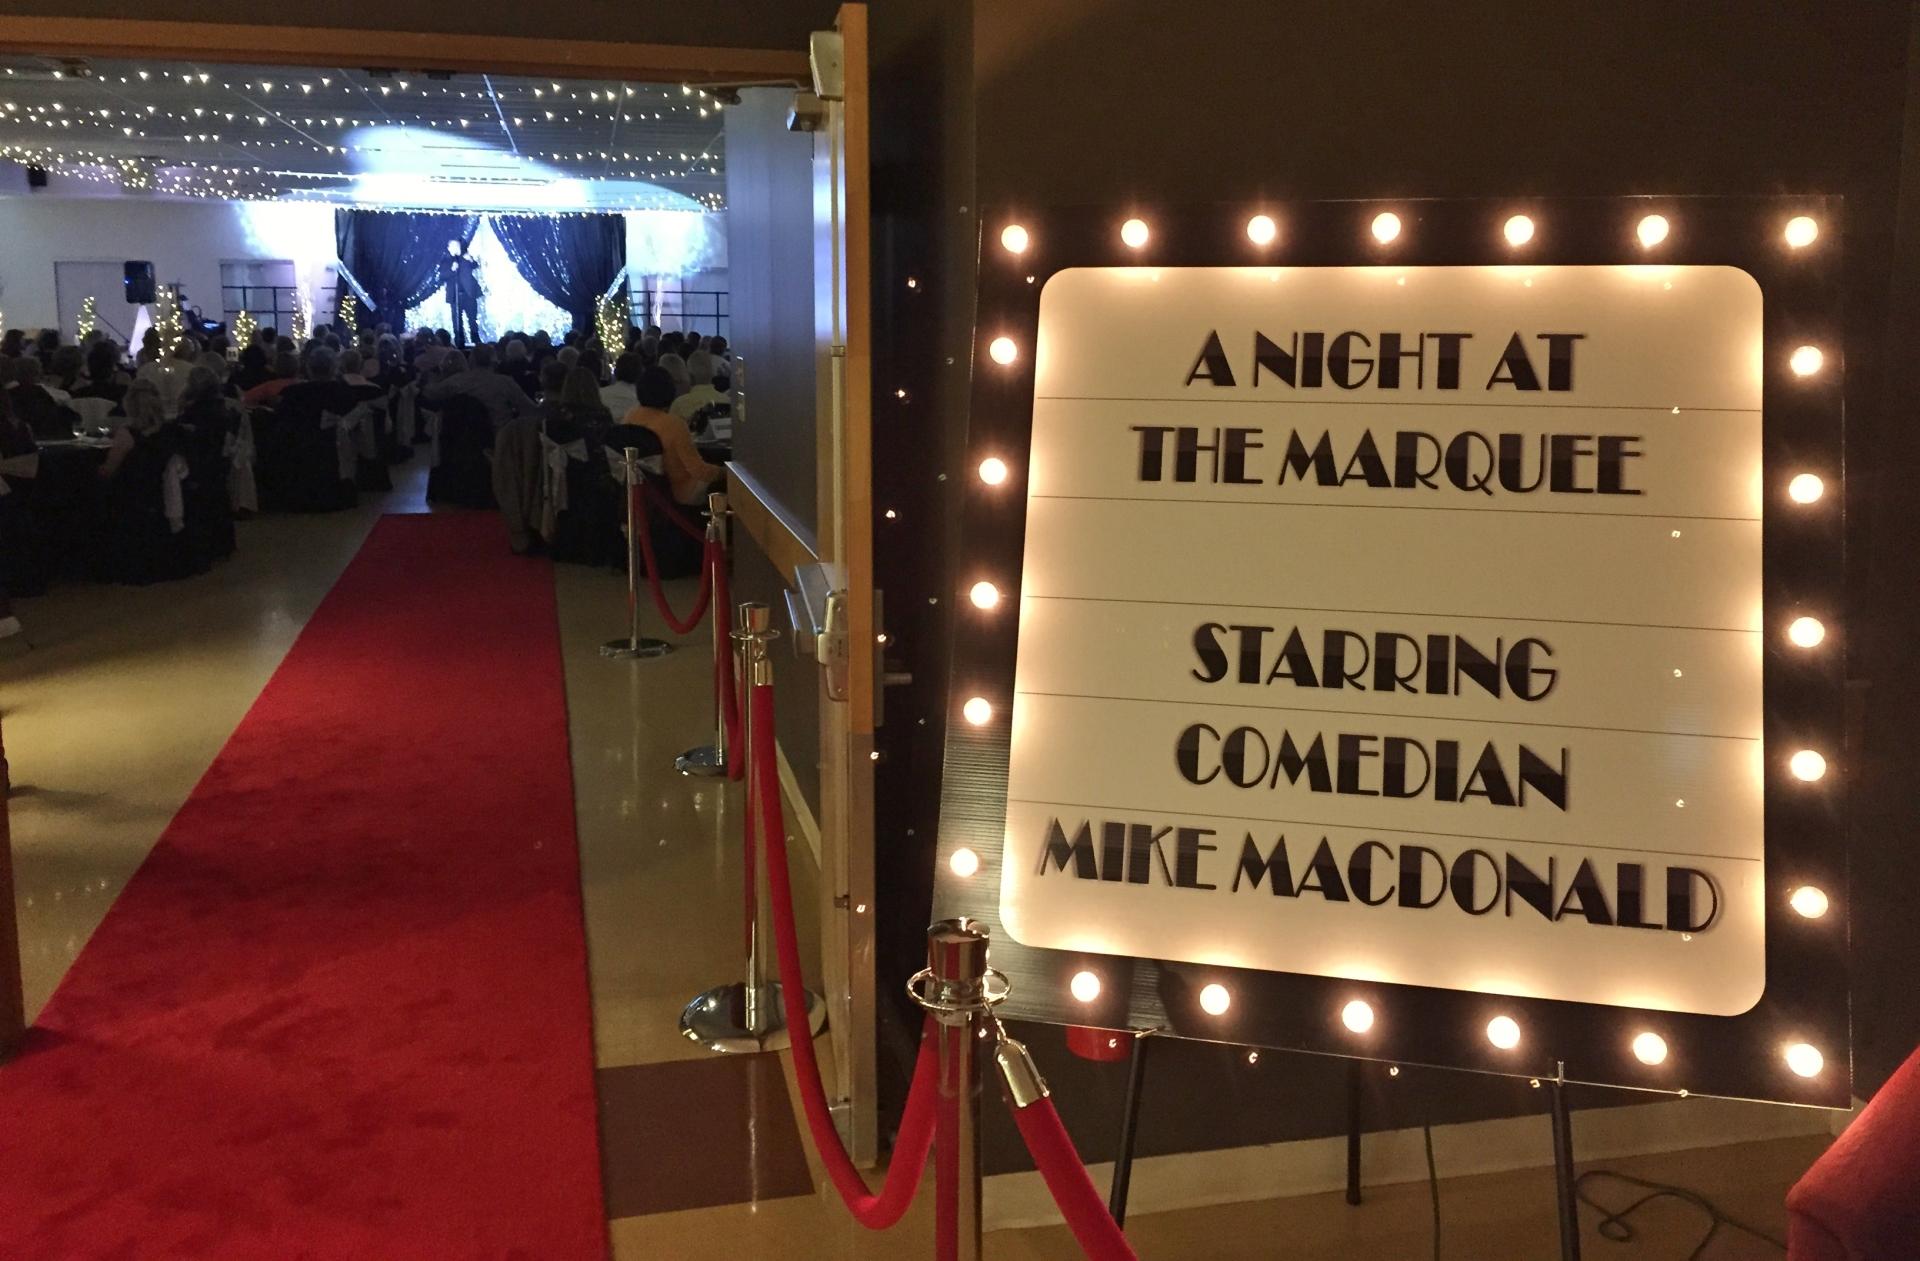 Comedy Night - Mike MacDonald